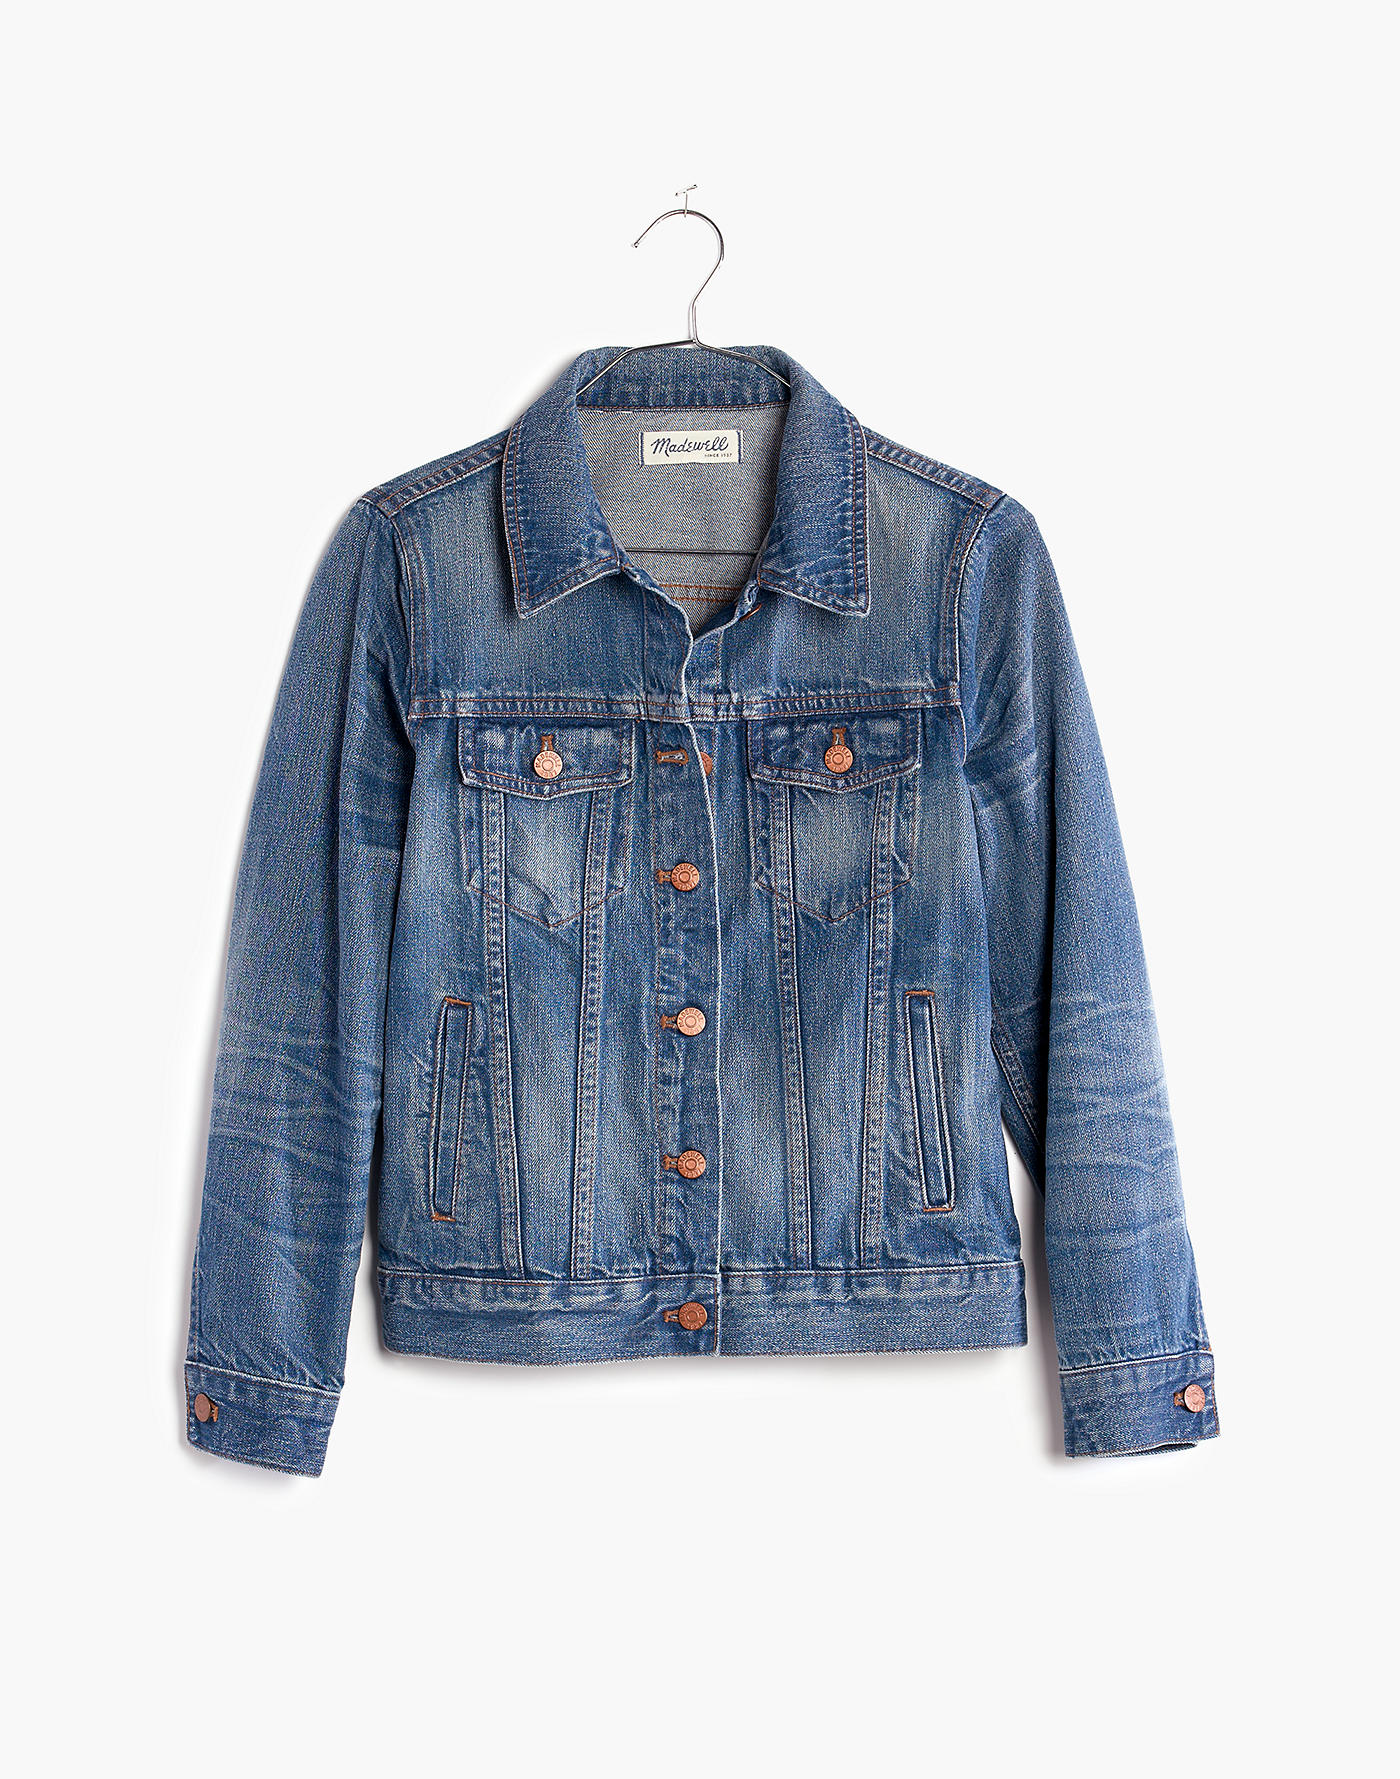 Meghan Markle madewell jean jacket